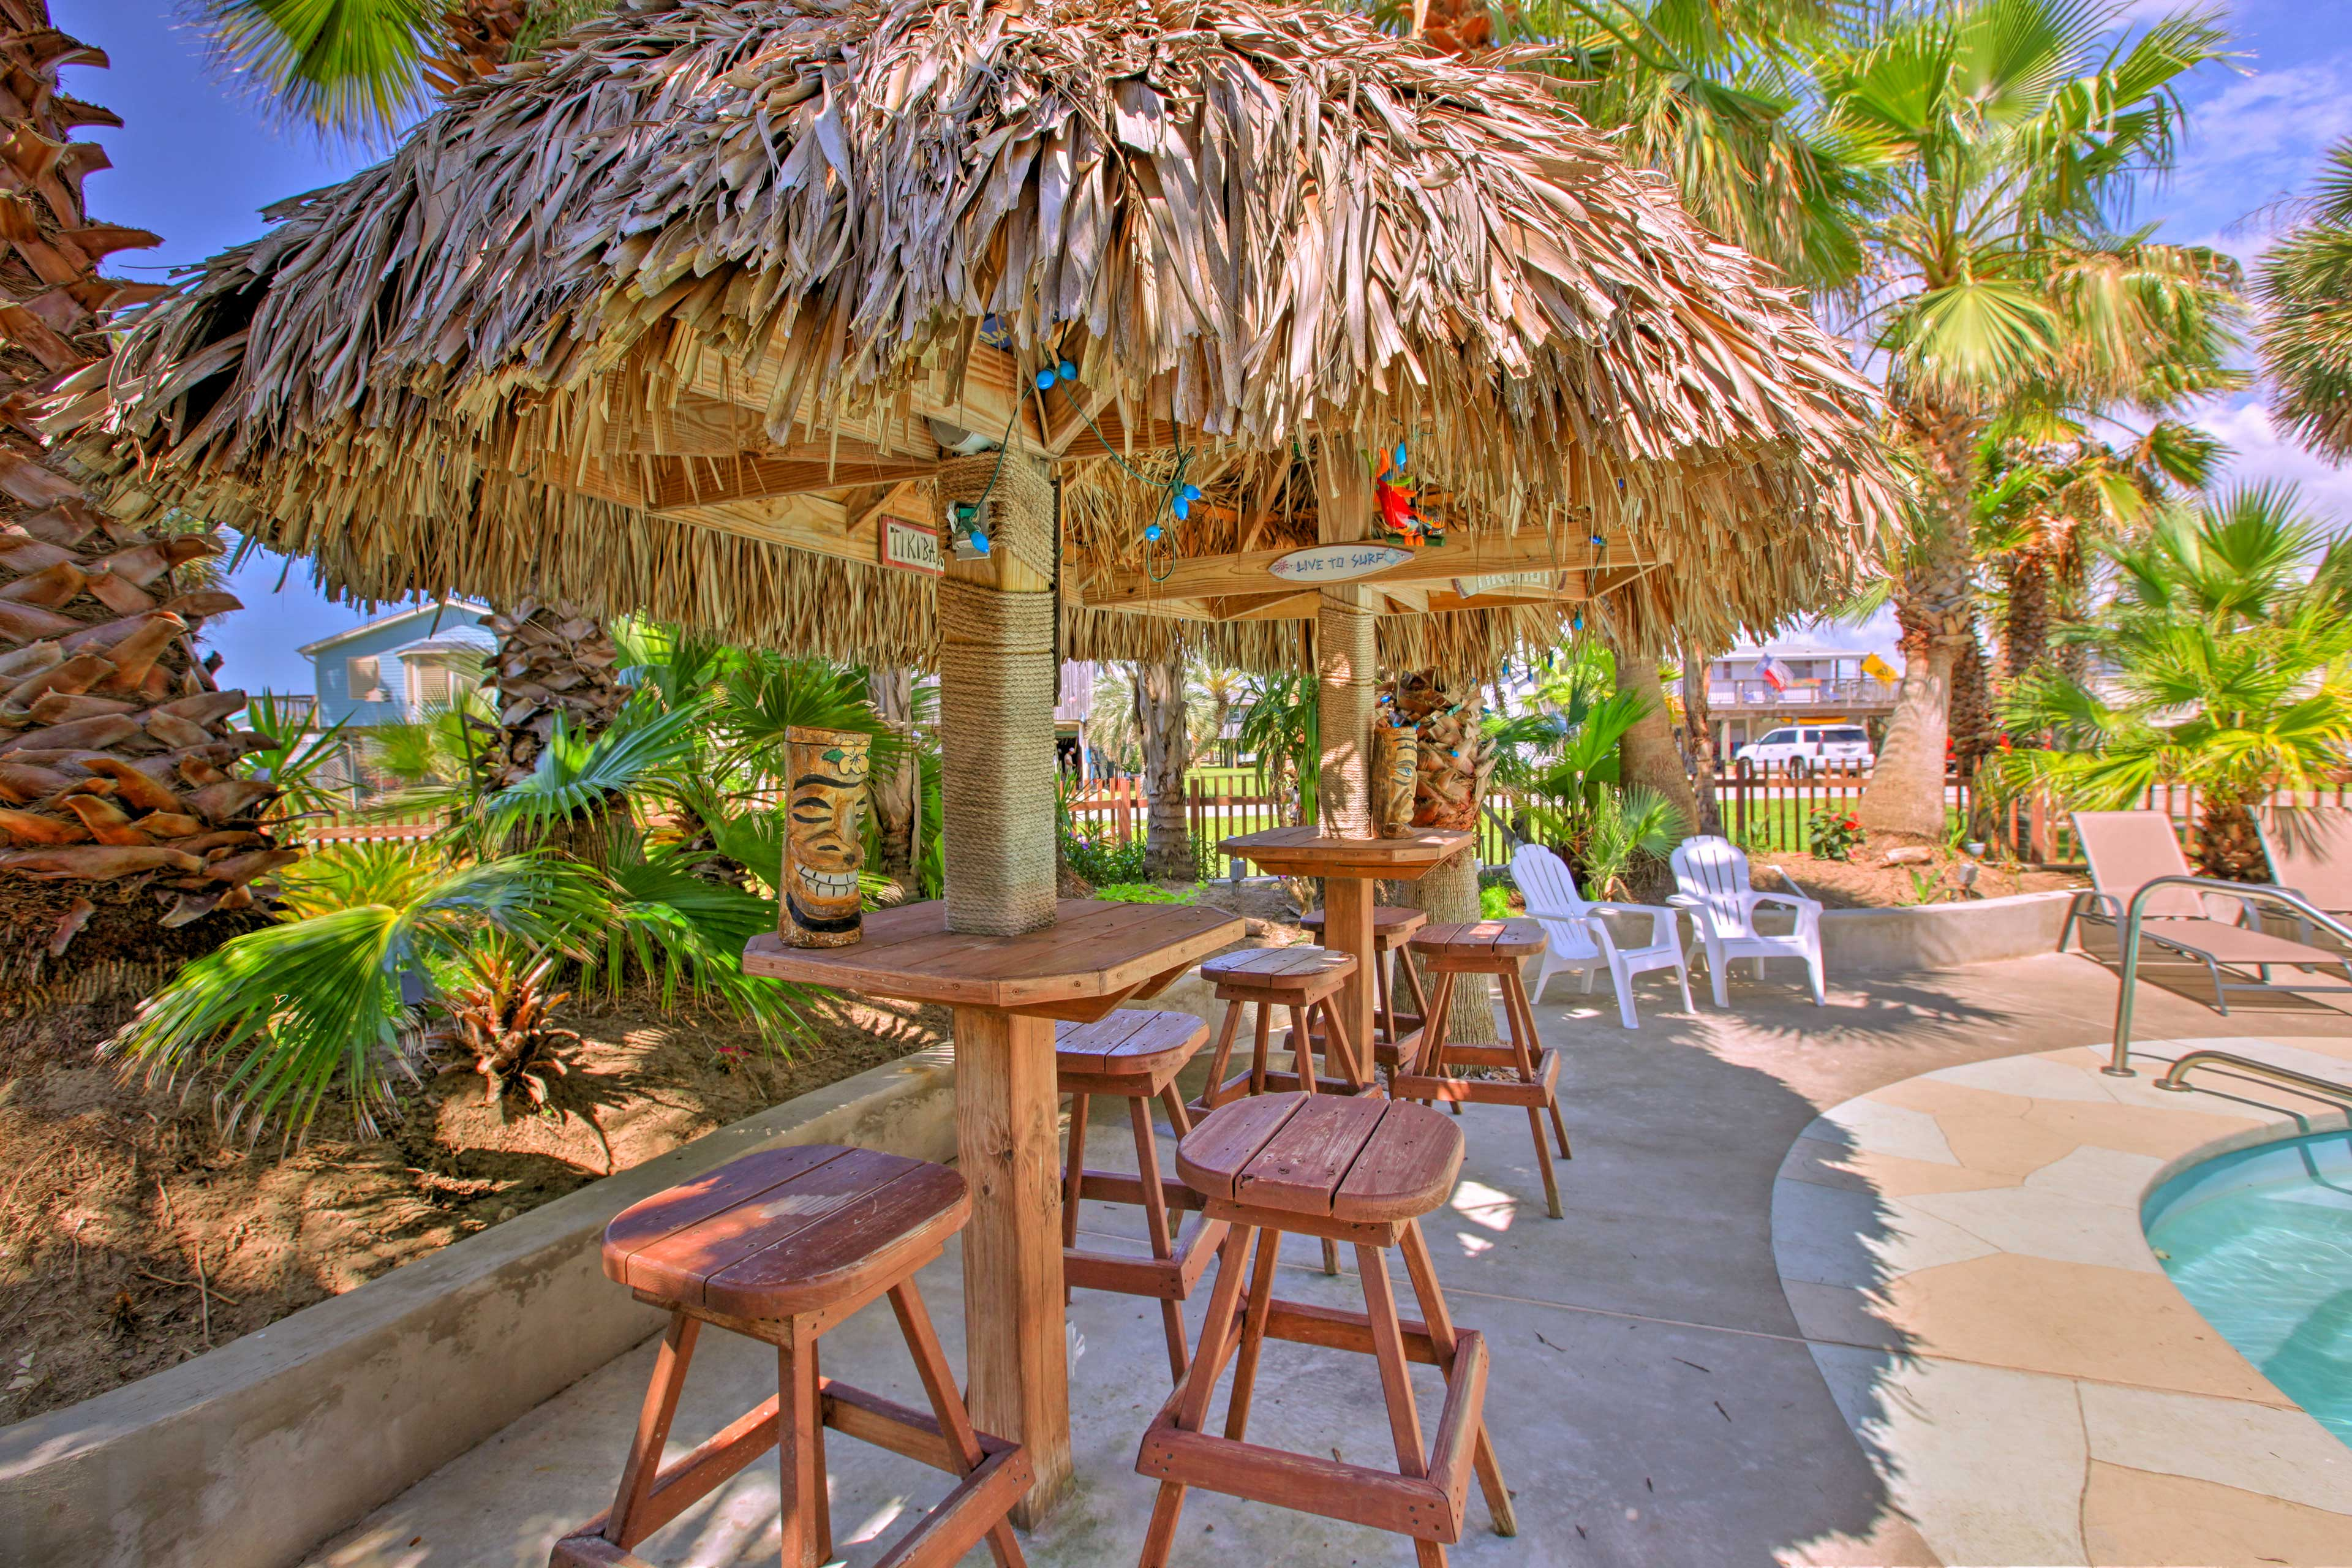 Enjoy island living under the palapa huts.